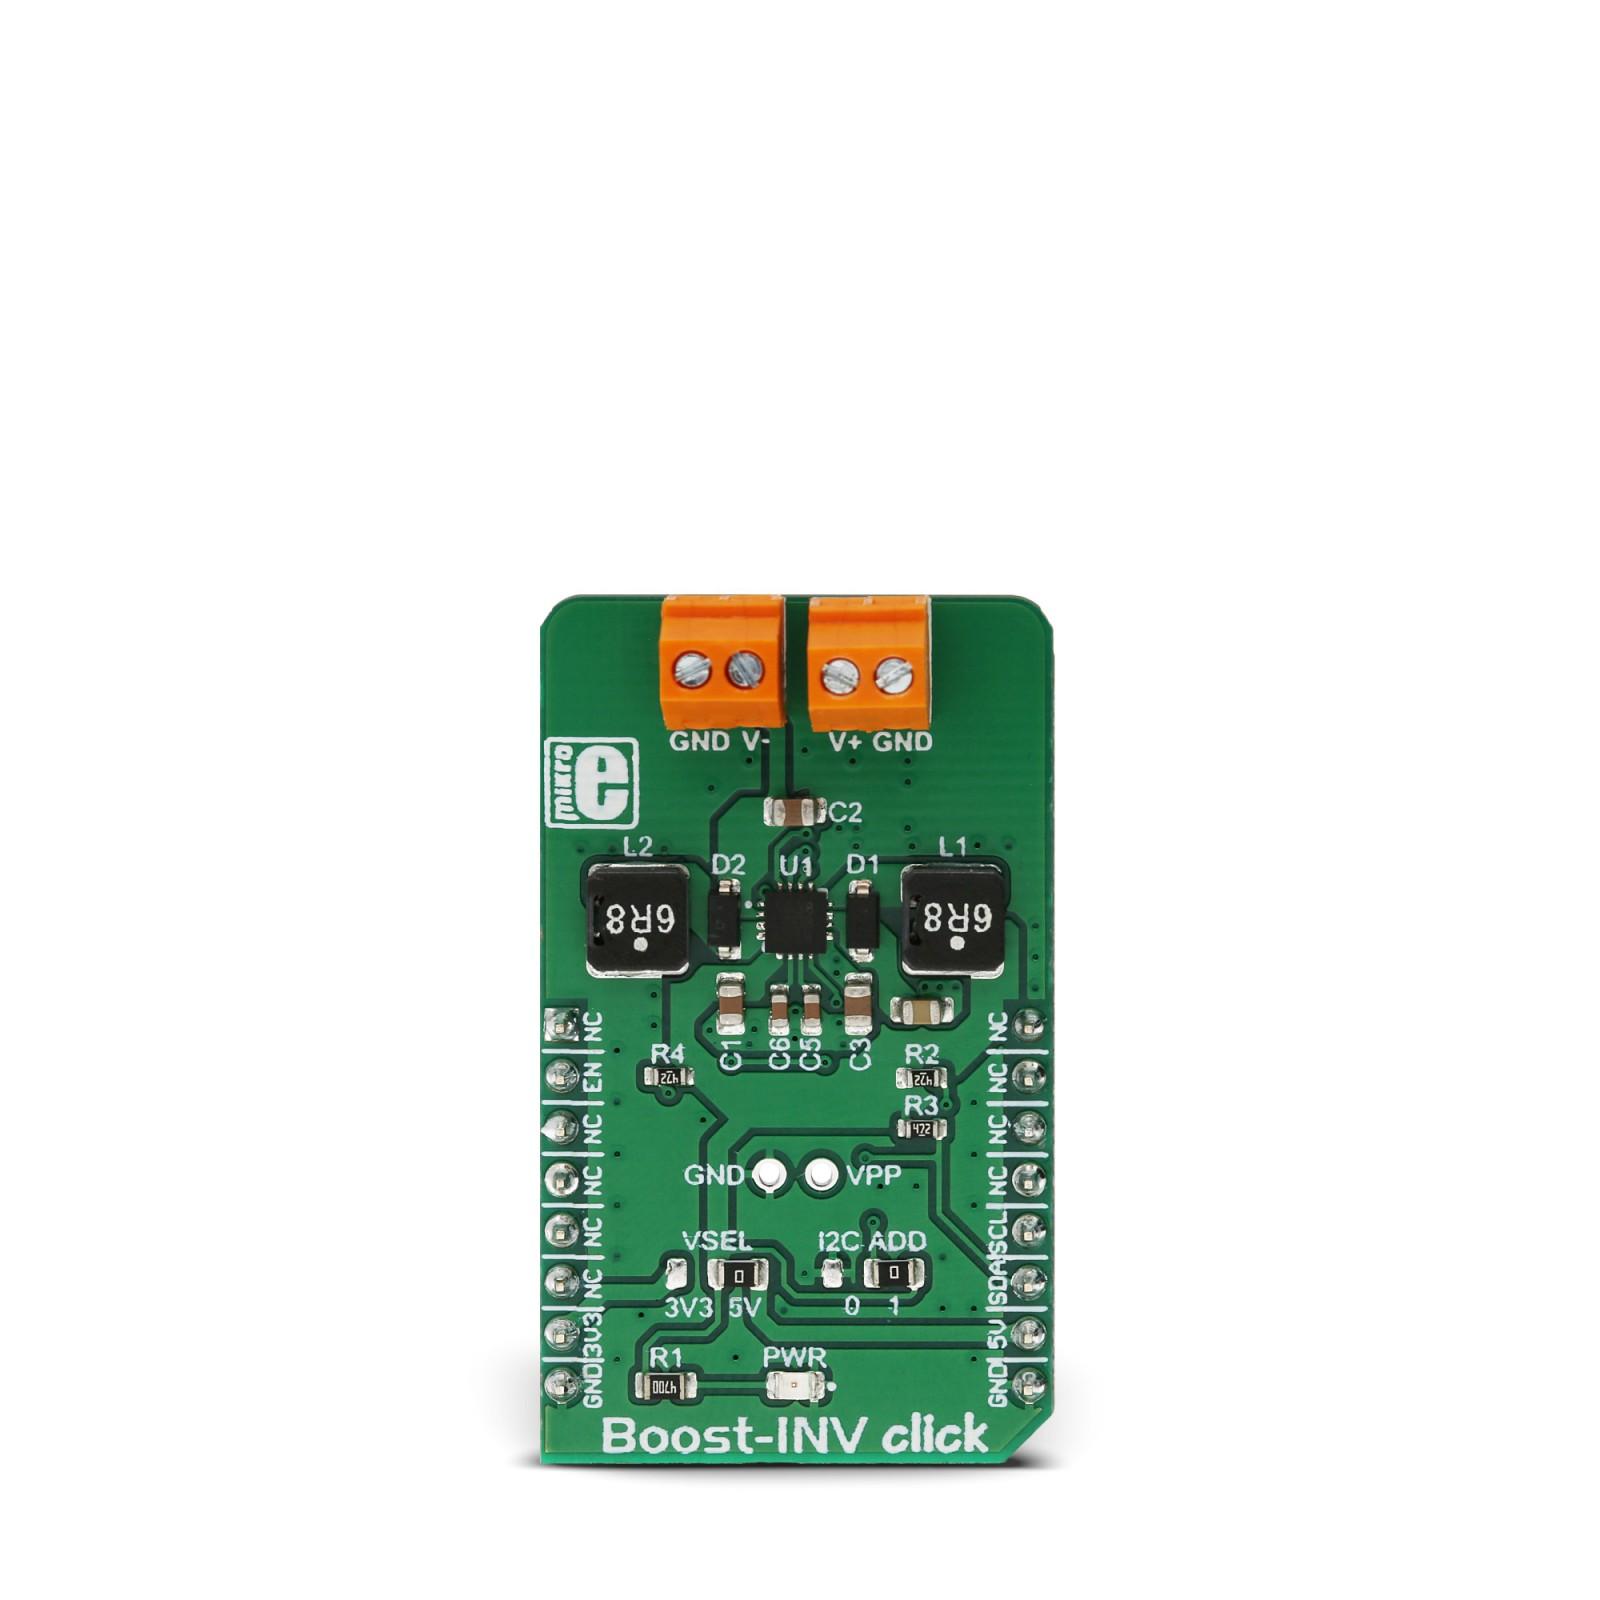 Boost Inv Click Mikroelektronika Here Is An Example Positive To Negative Converter Circuit It Will Mgctlbxnmzp Mgctlbxv5112 Mgctlbxlc Mgctlbxpprestashop